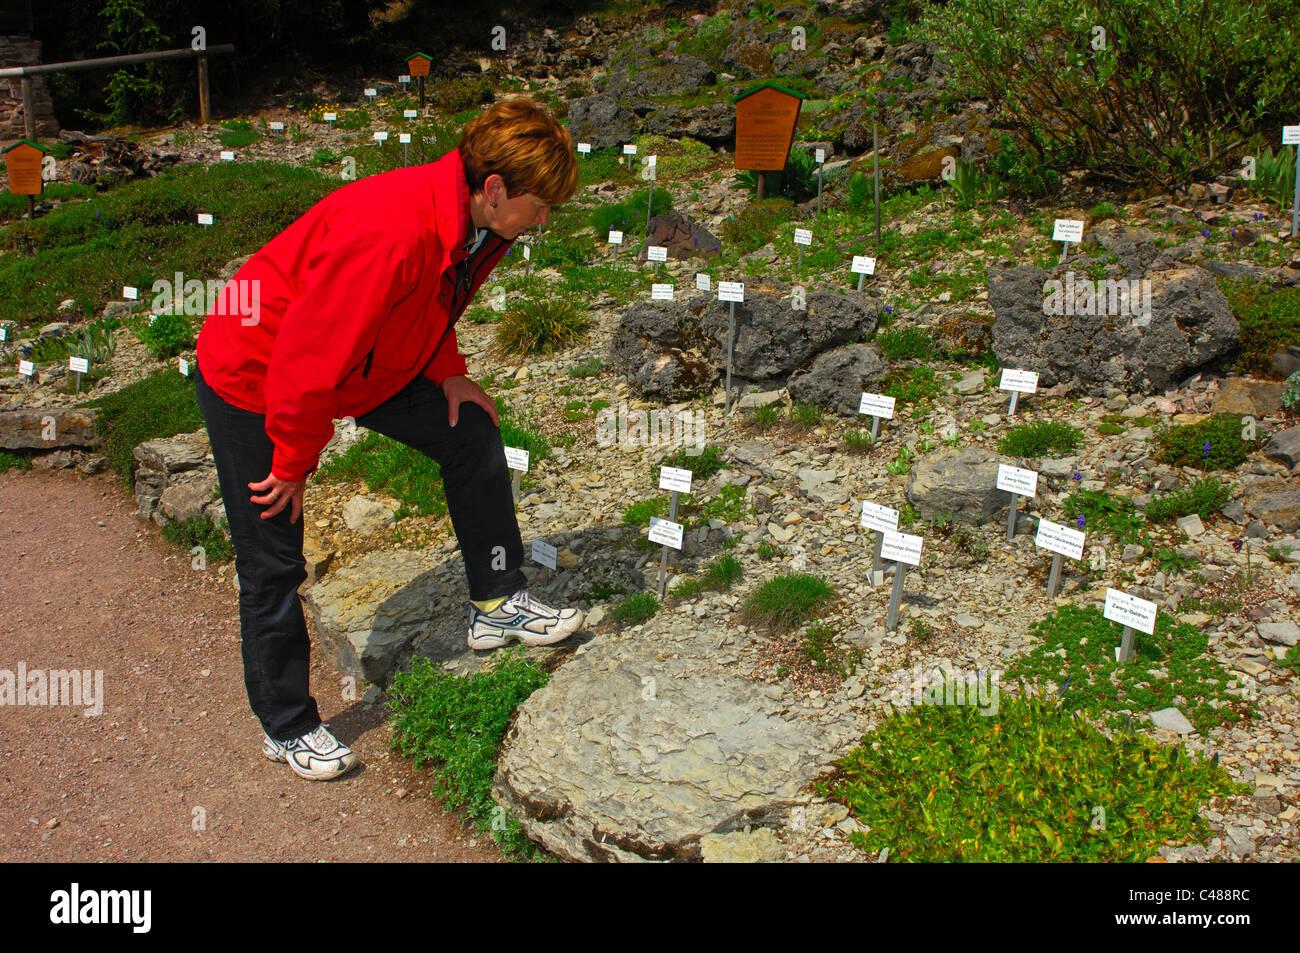 Visitor looking at alpine plants in the garden of mountain flora Rennsteiggarten in Oberhof, Thuringia, Germany Stock Photo